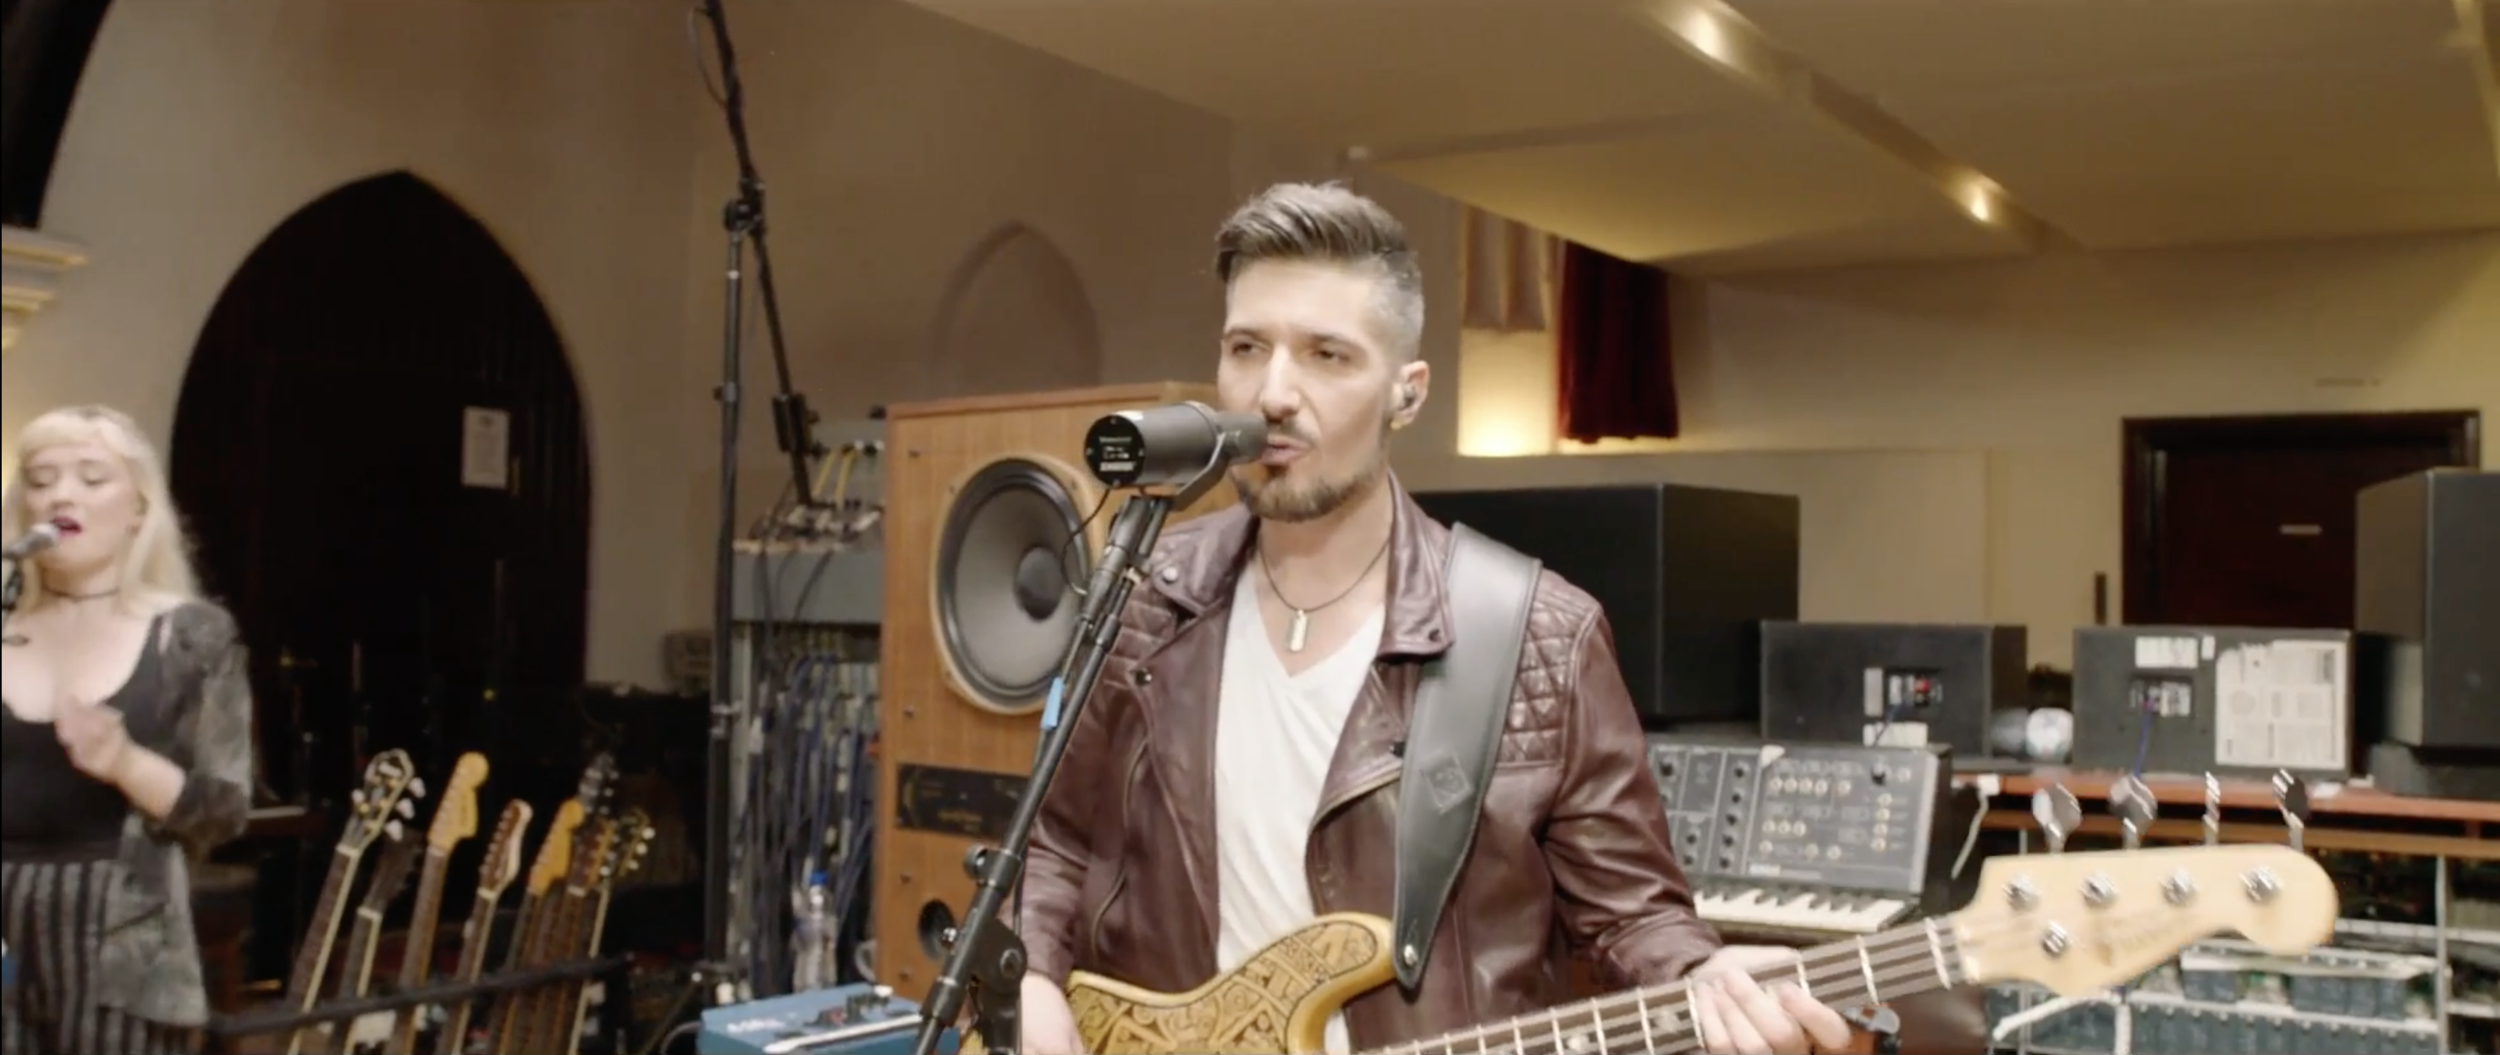 George IV Church Studios Live Sessions